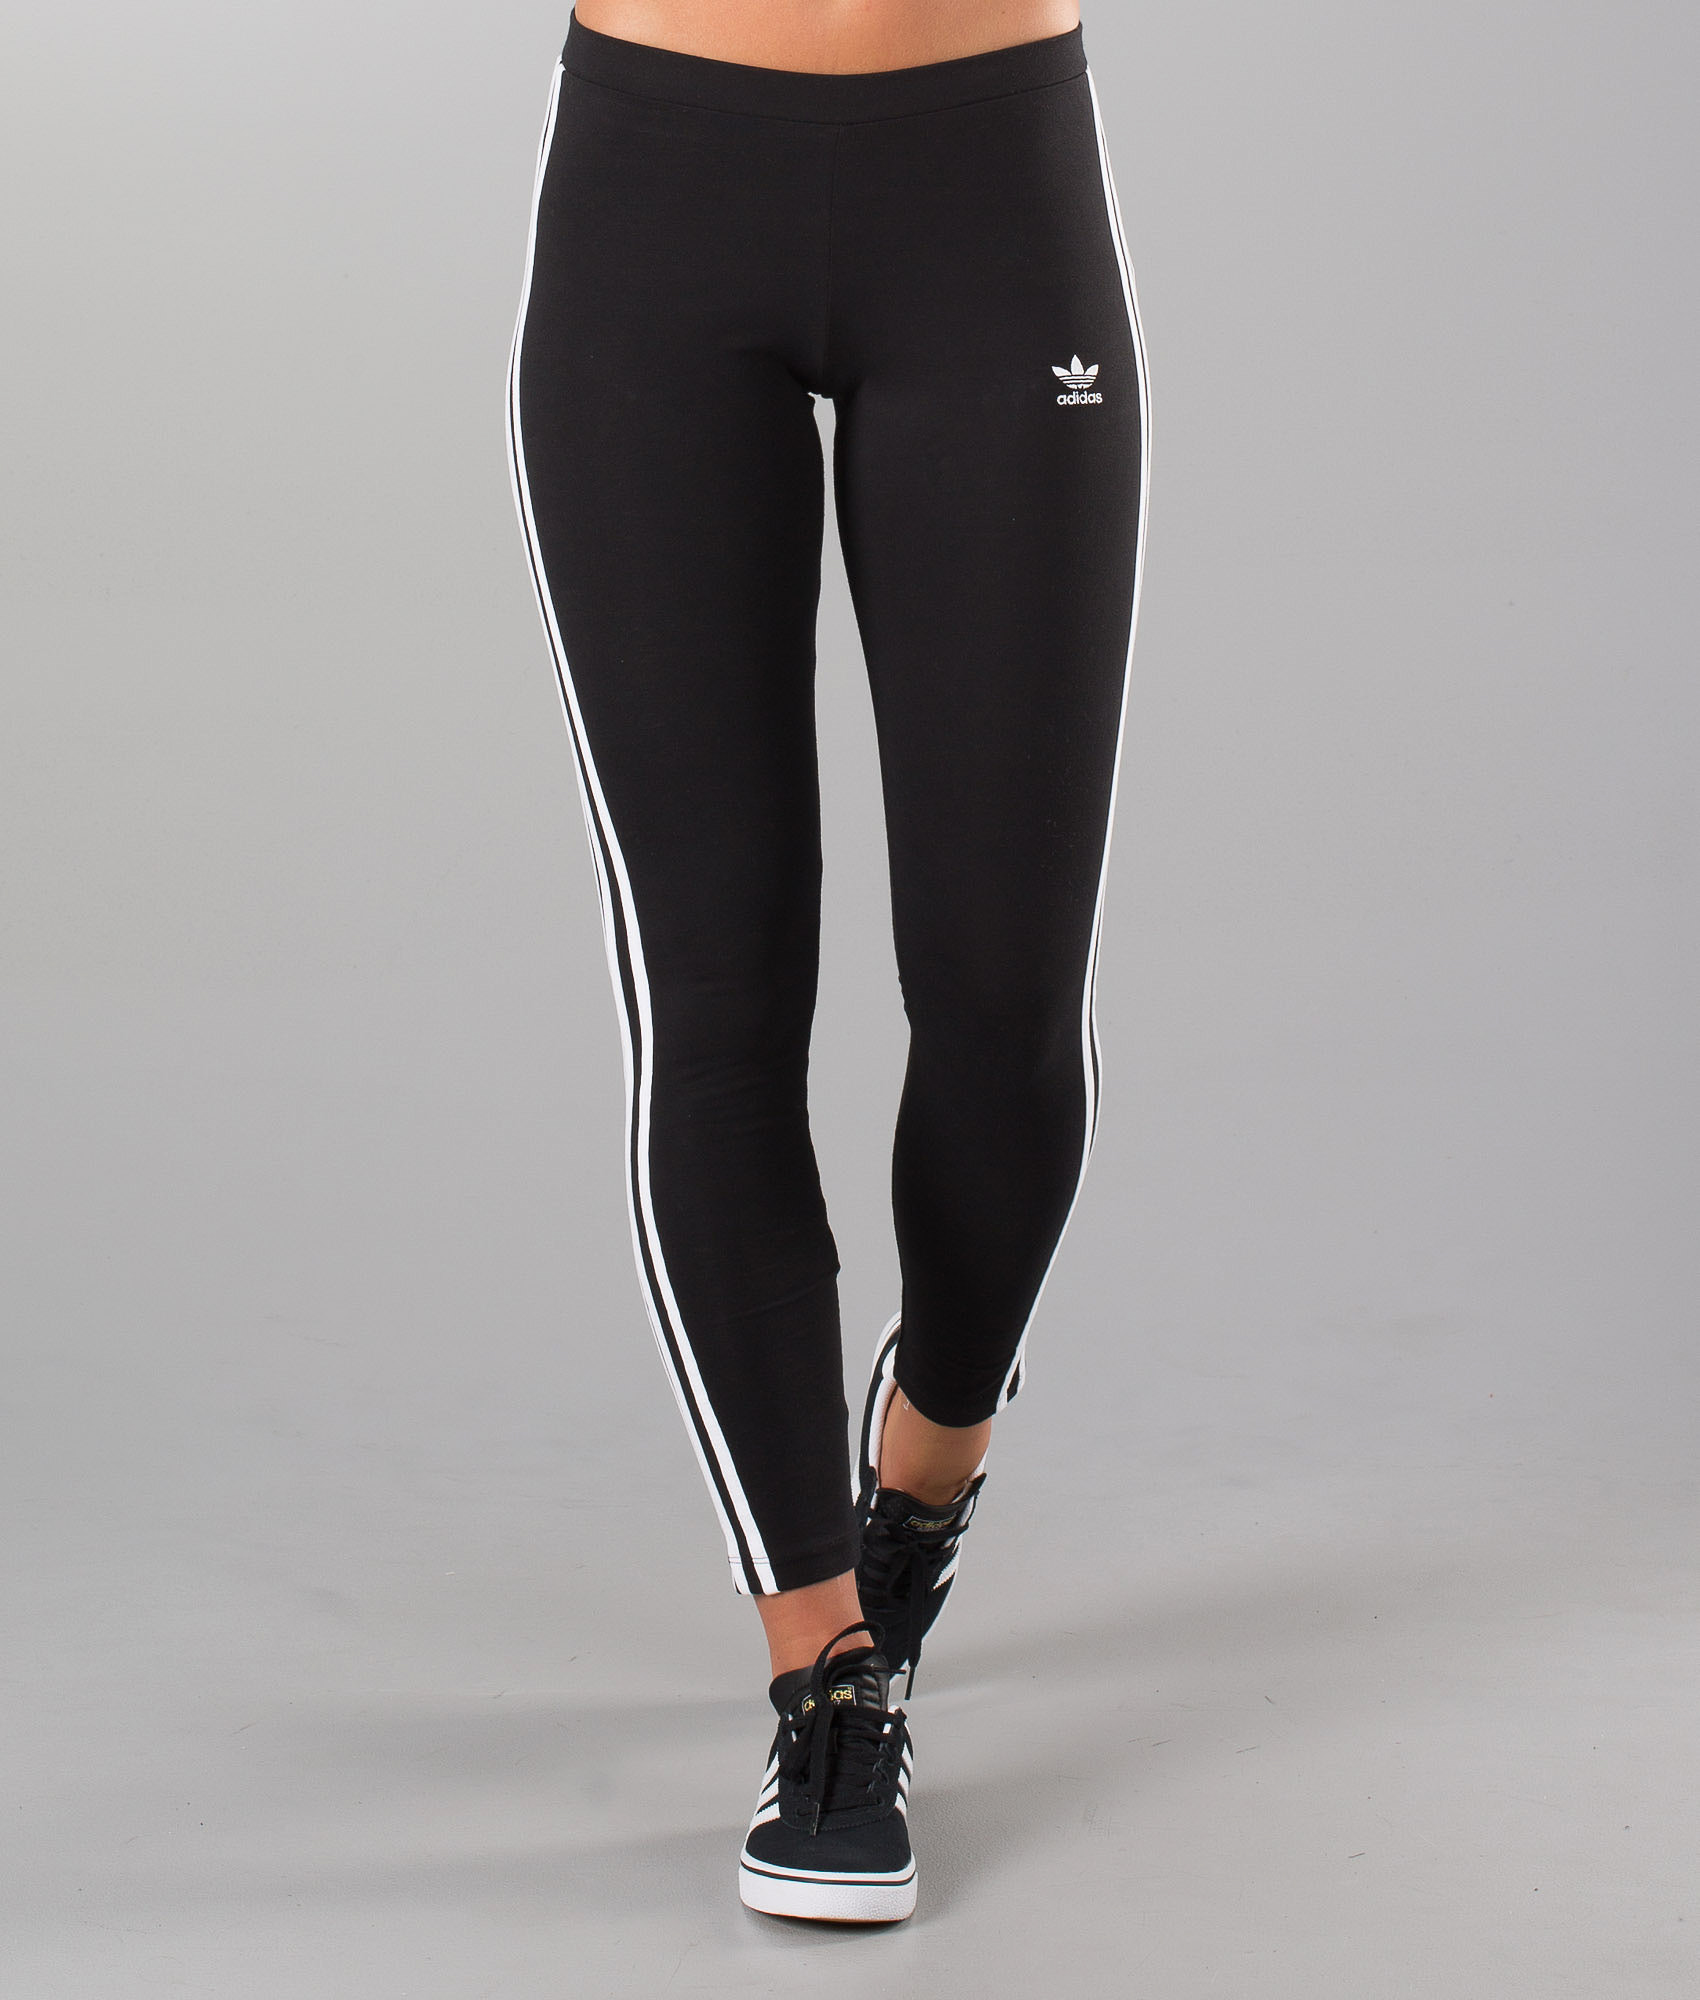 7f47058b0 Adidas Originals 3 Stripes Leggings Black - Ridestore.com